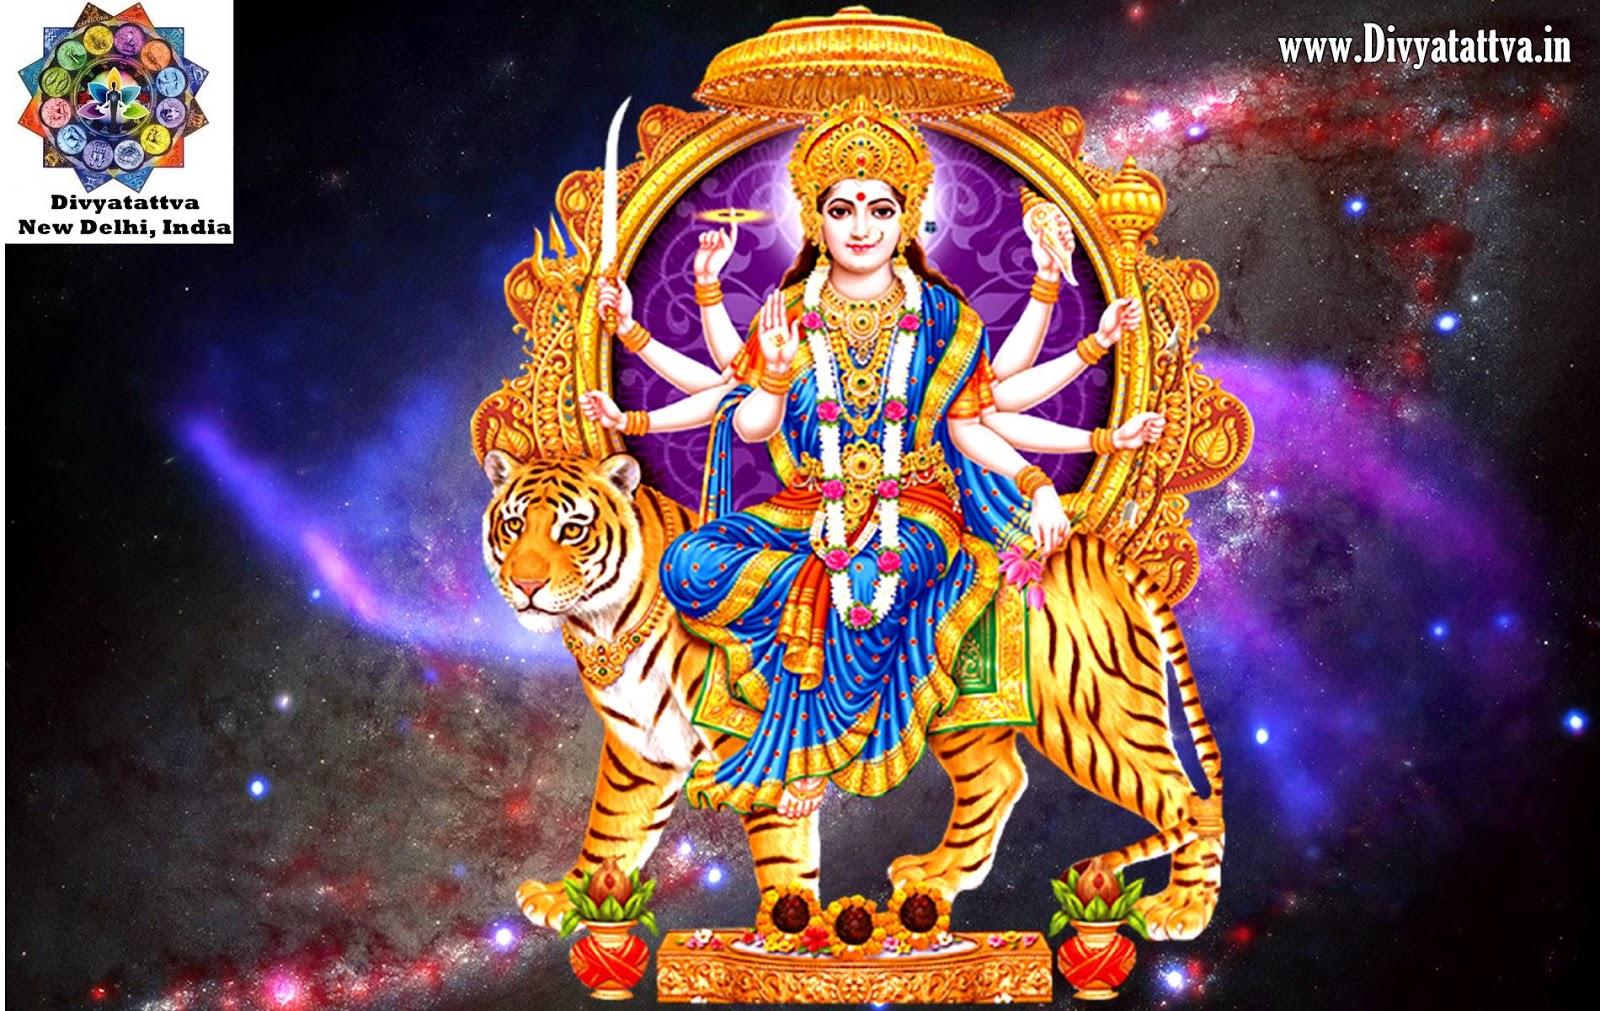 Goddess Durga Wallpapers Devi Kali Backgrounds Laxmi Sarasvati Pictures